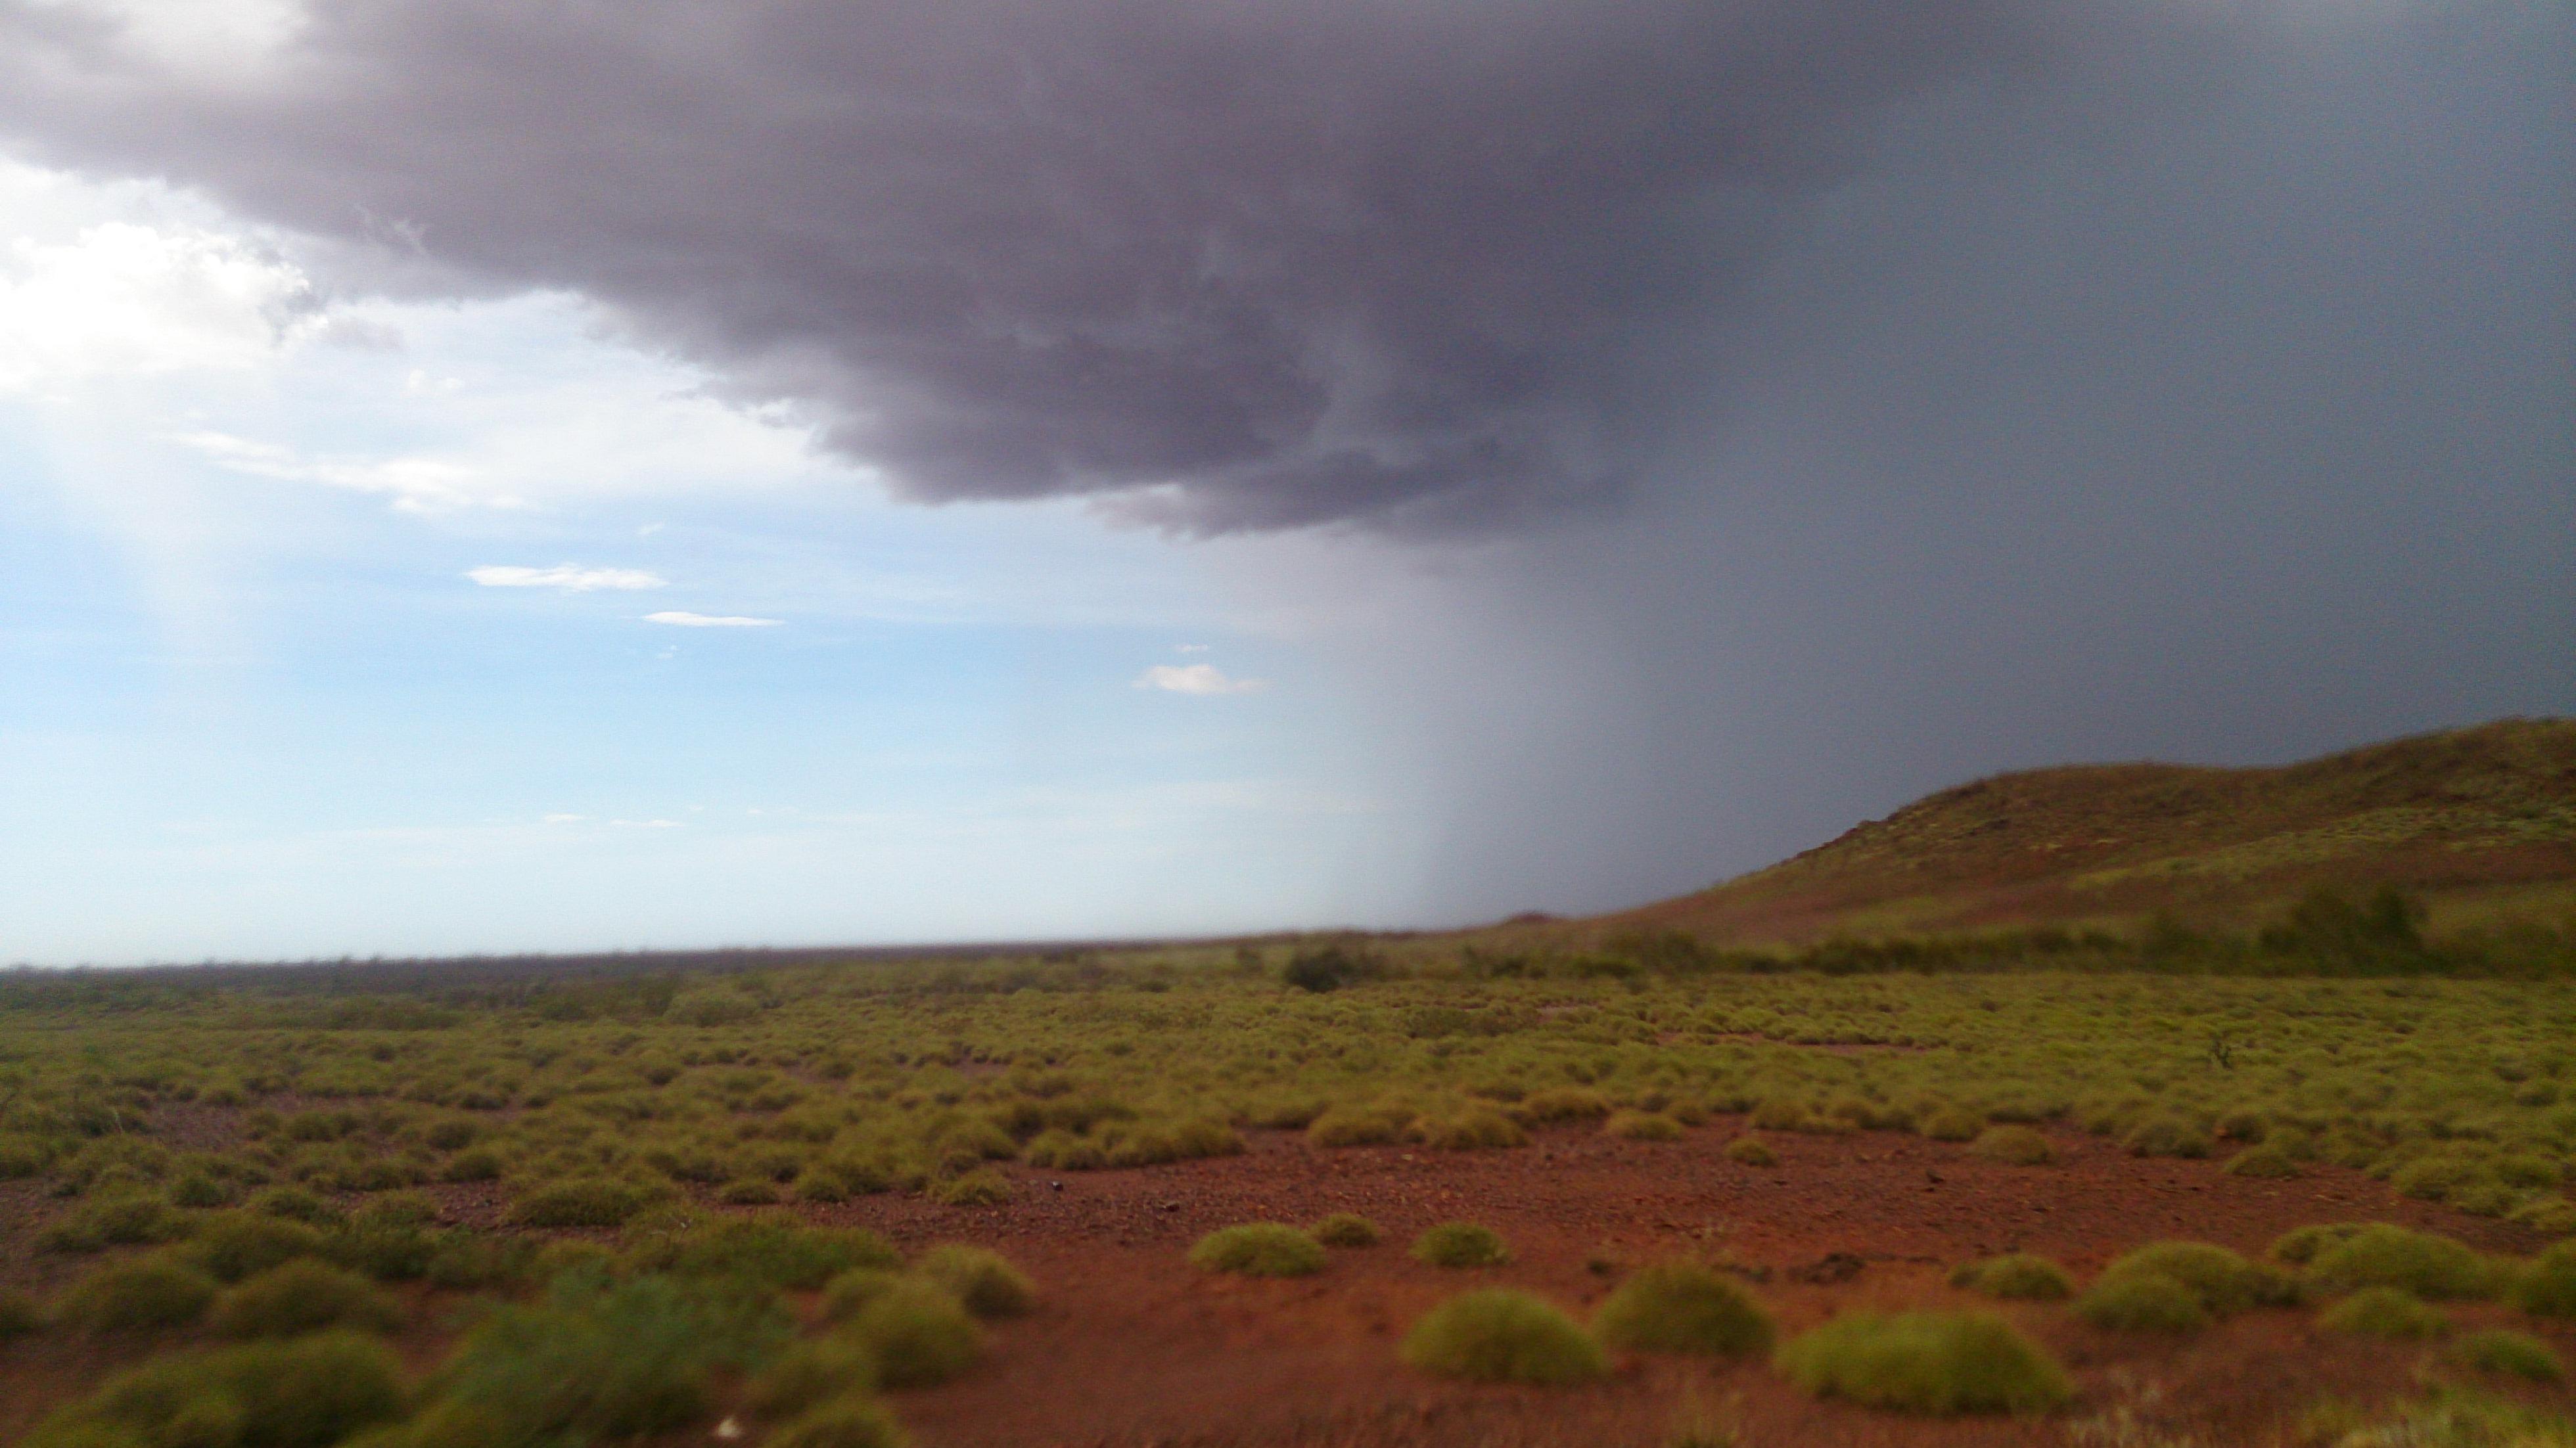 A storm in the Pilbara.